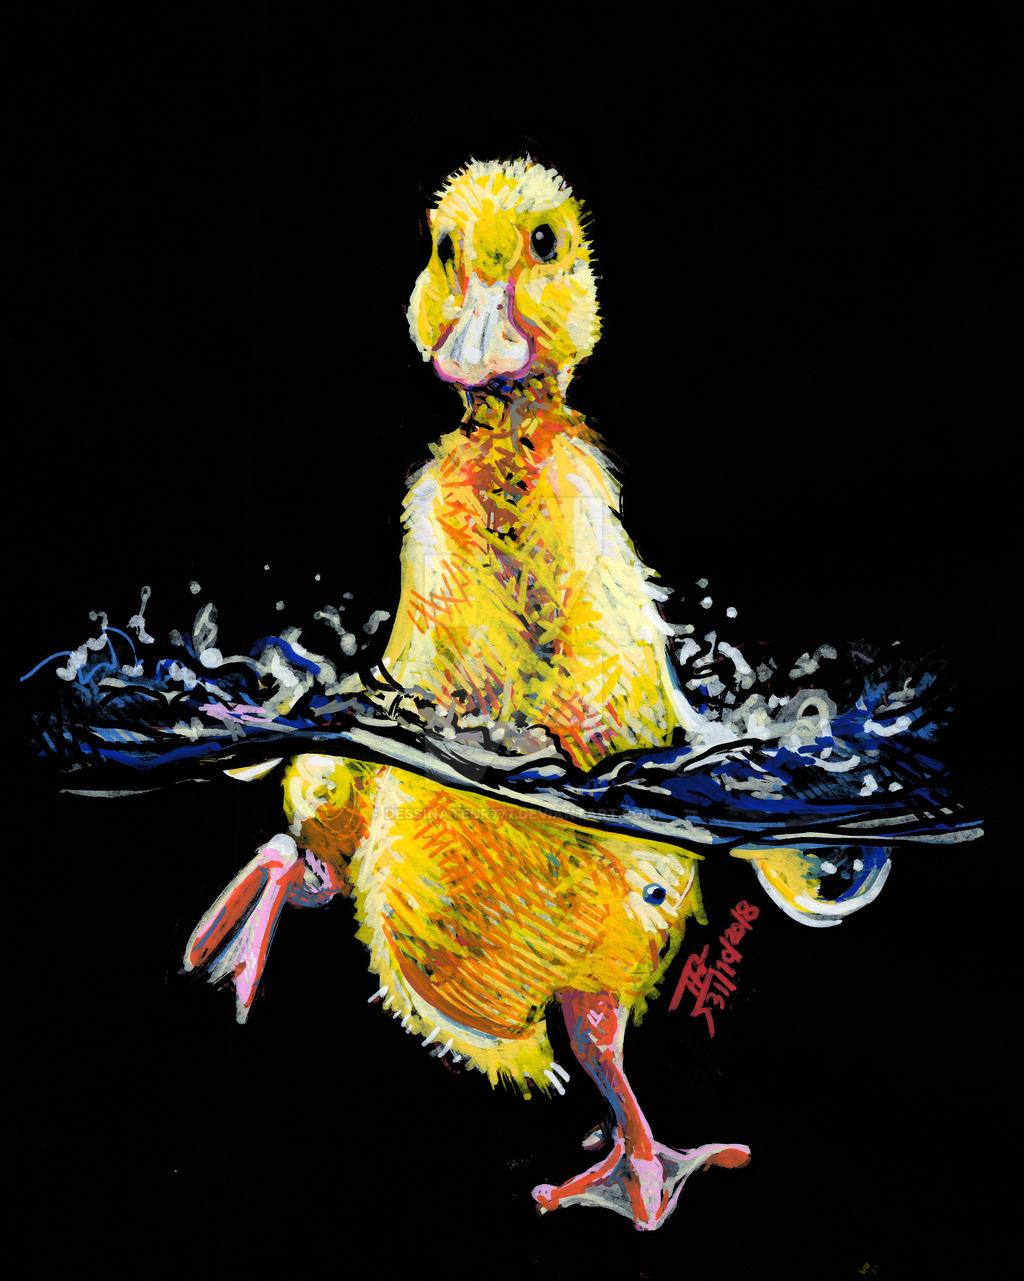 Yellowsubmarine by dessinateur777